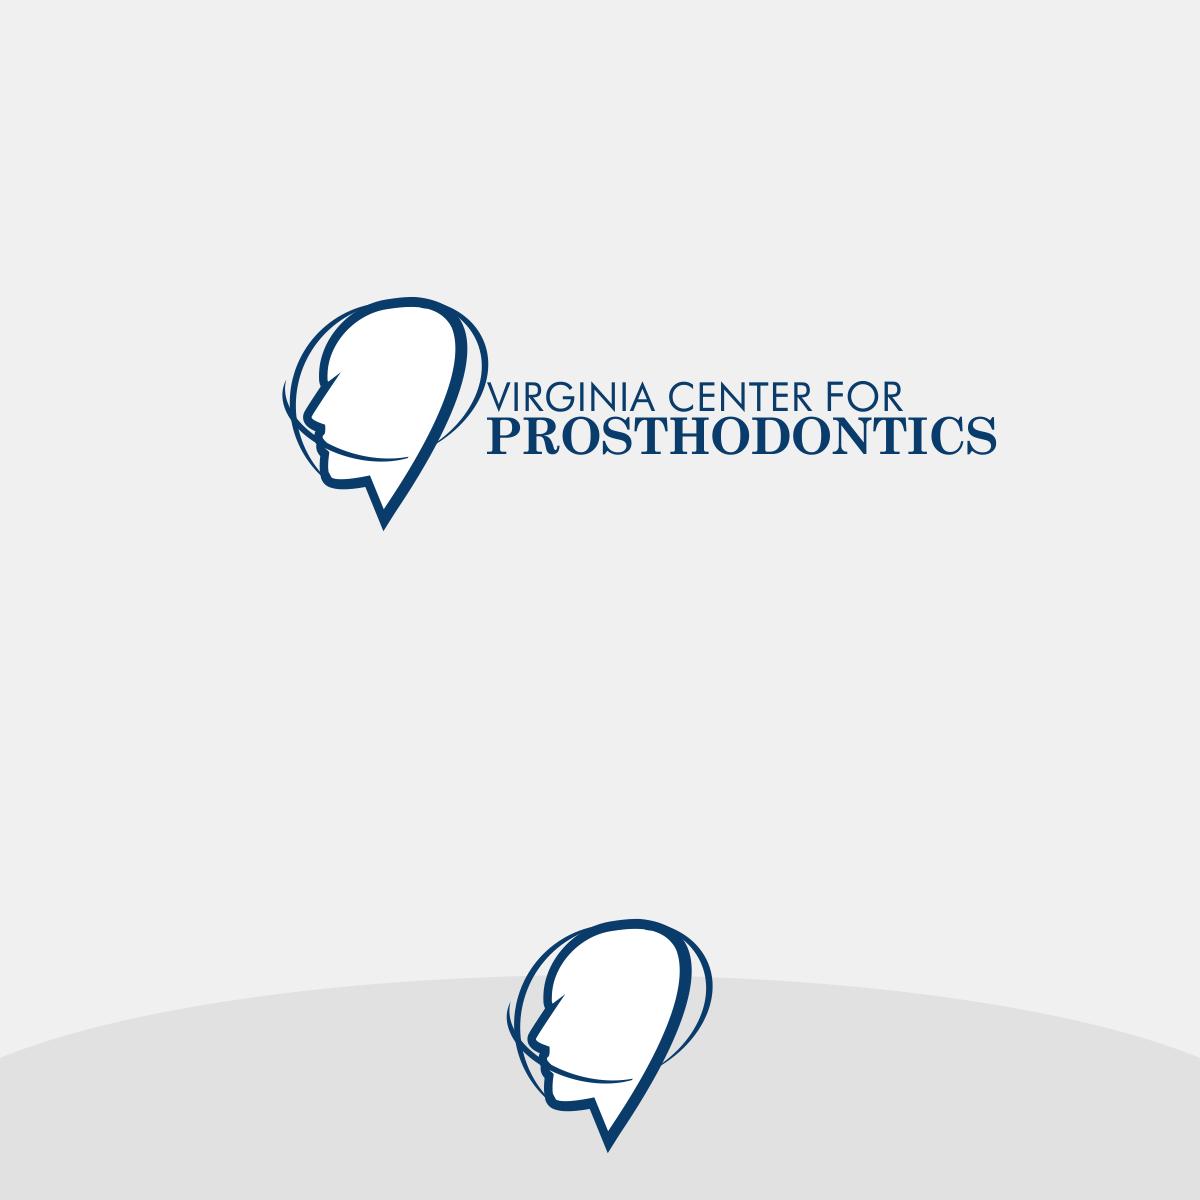 Logo Design by Private User - Entry No. 72 in the Logo Design Contest Imaginative Logo Design for Virginia Center for Prosthodontics.